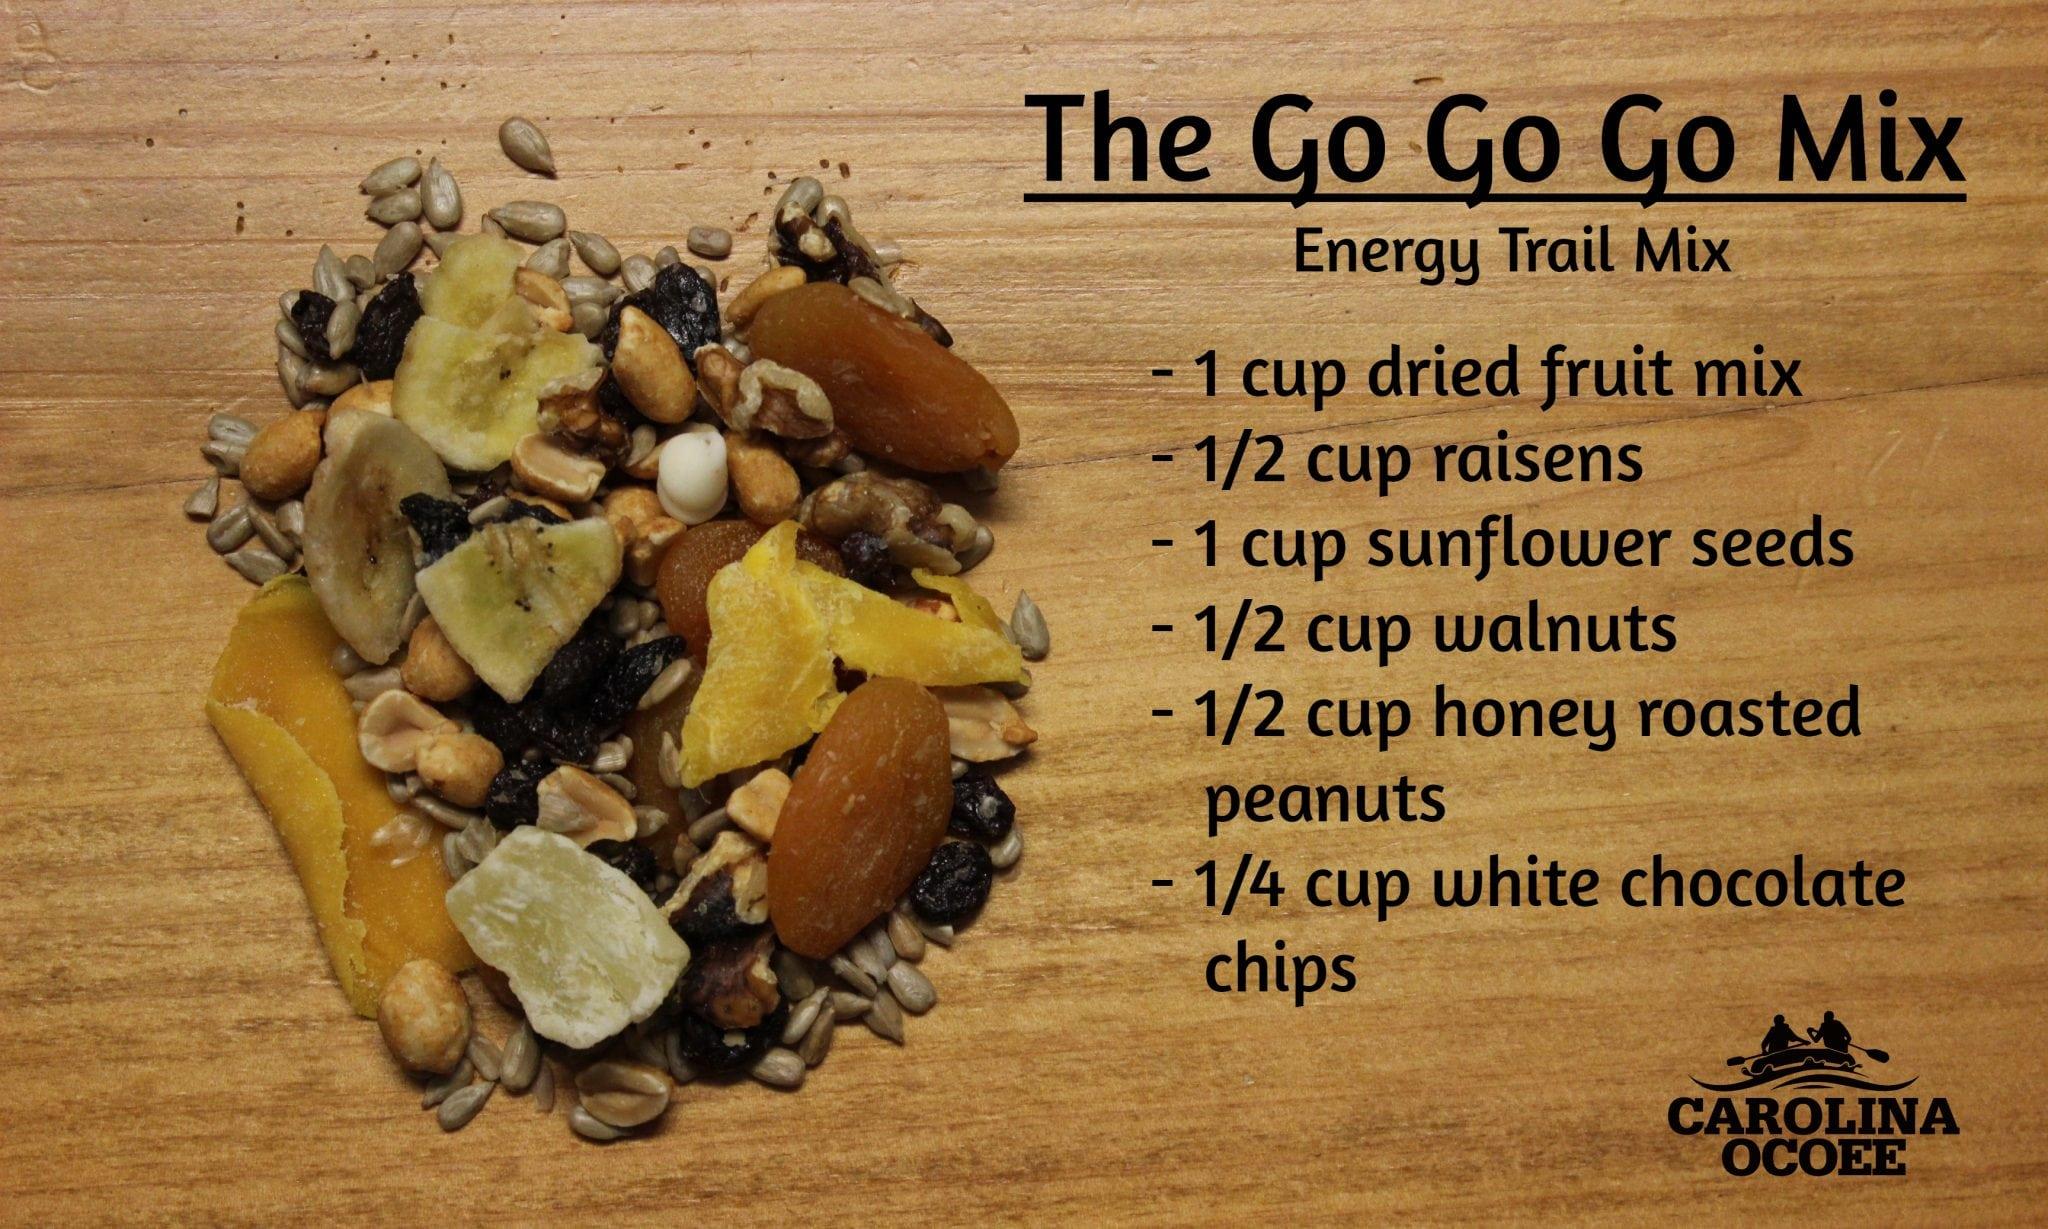 The Go Go Go Mix - Ocoee River Rafting